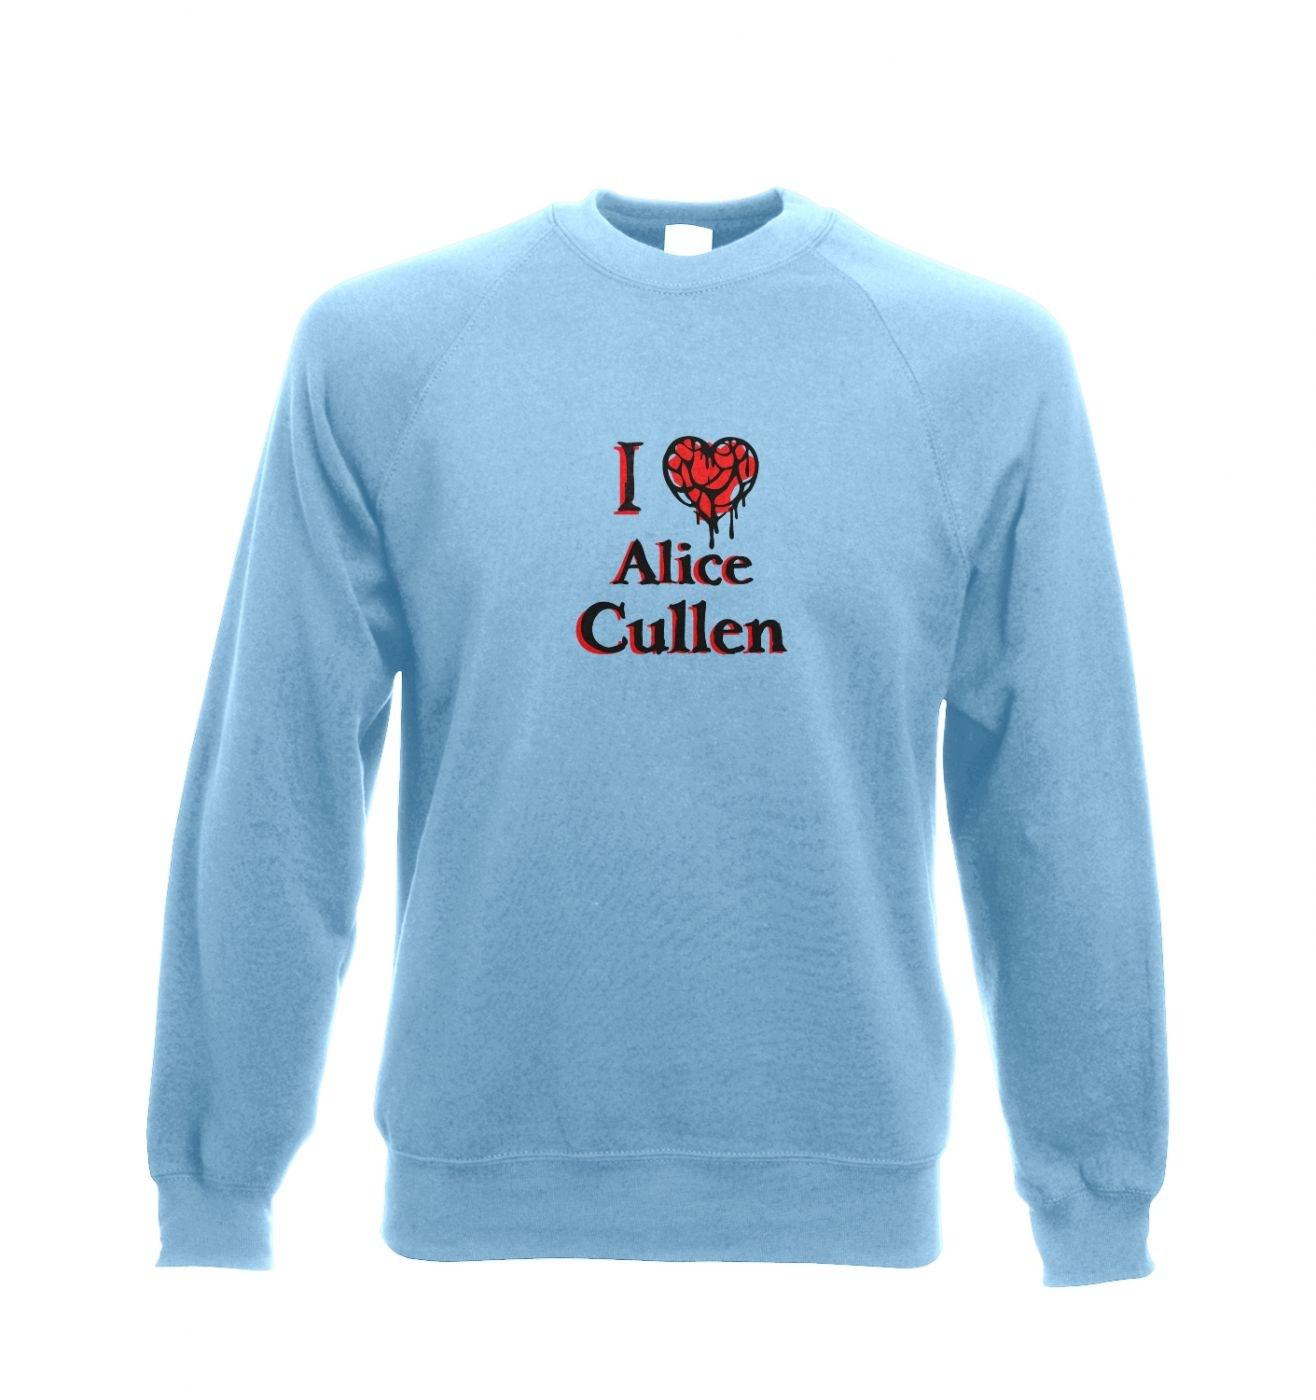 I heart Alice Cullen Adult Crewneck Sweatshirt  - Inspired by Twilight